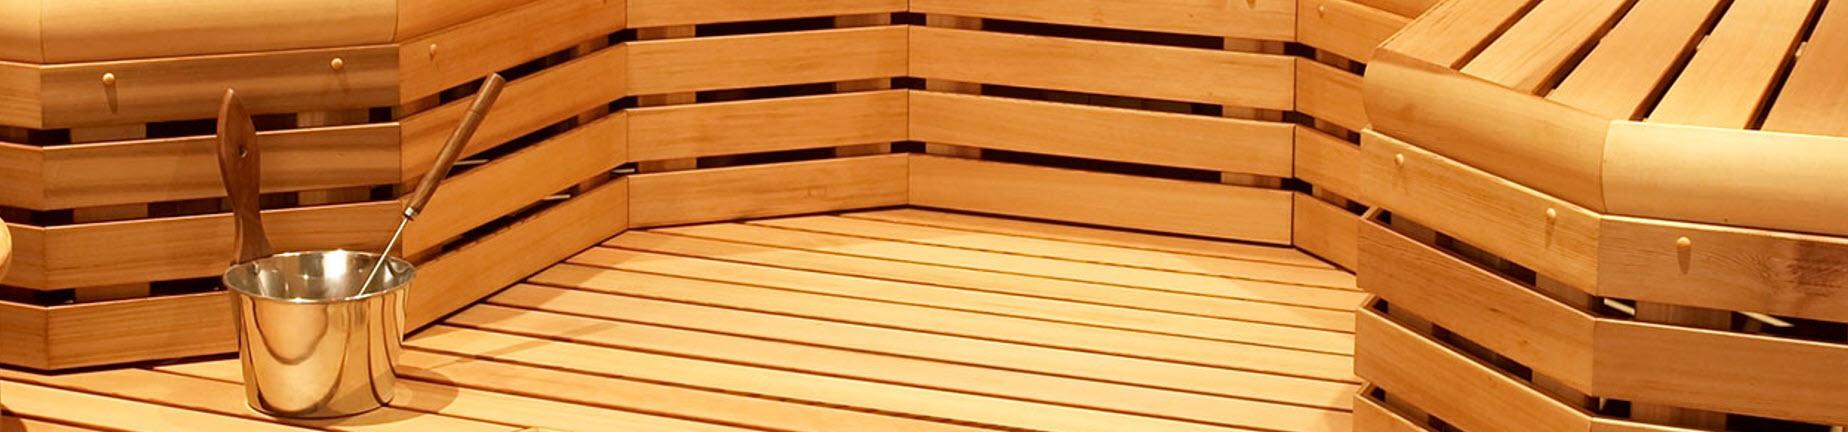 Can a Sauna Really Help My Back Pain? Sauna Sale Ames